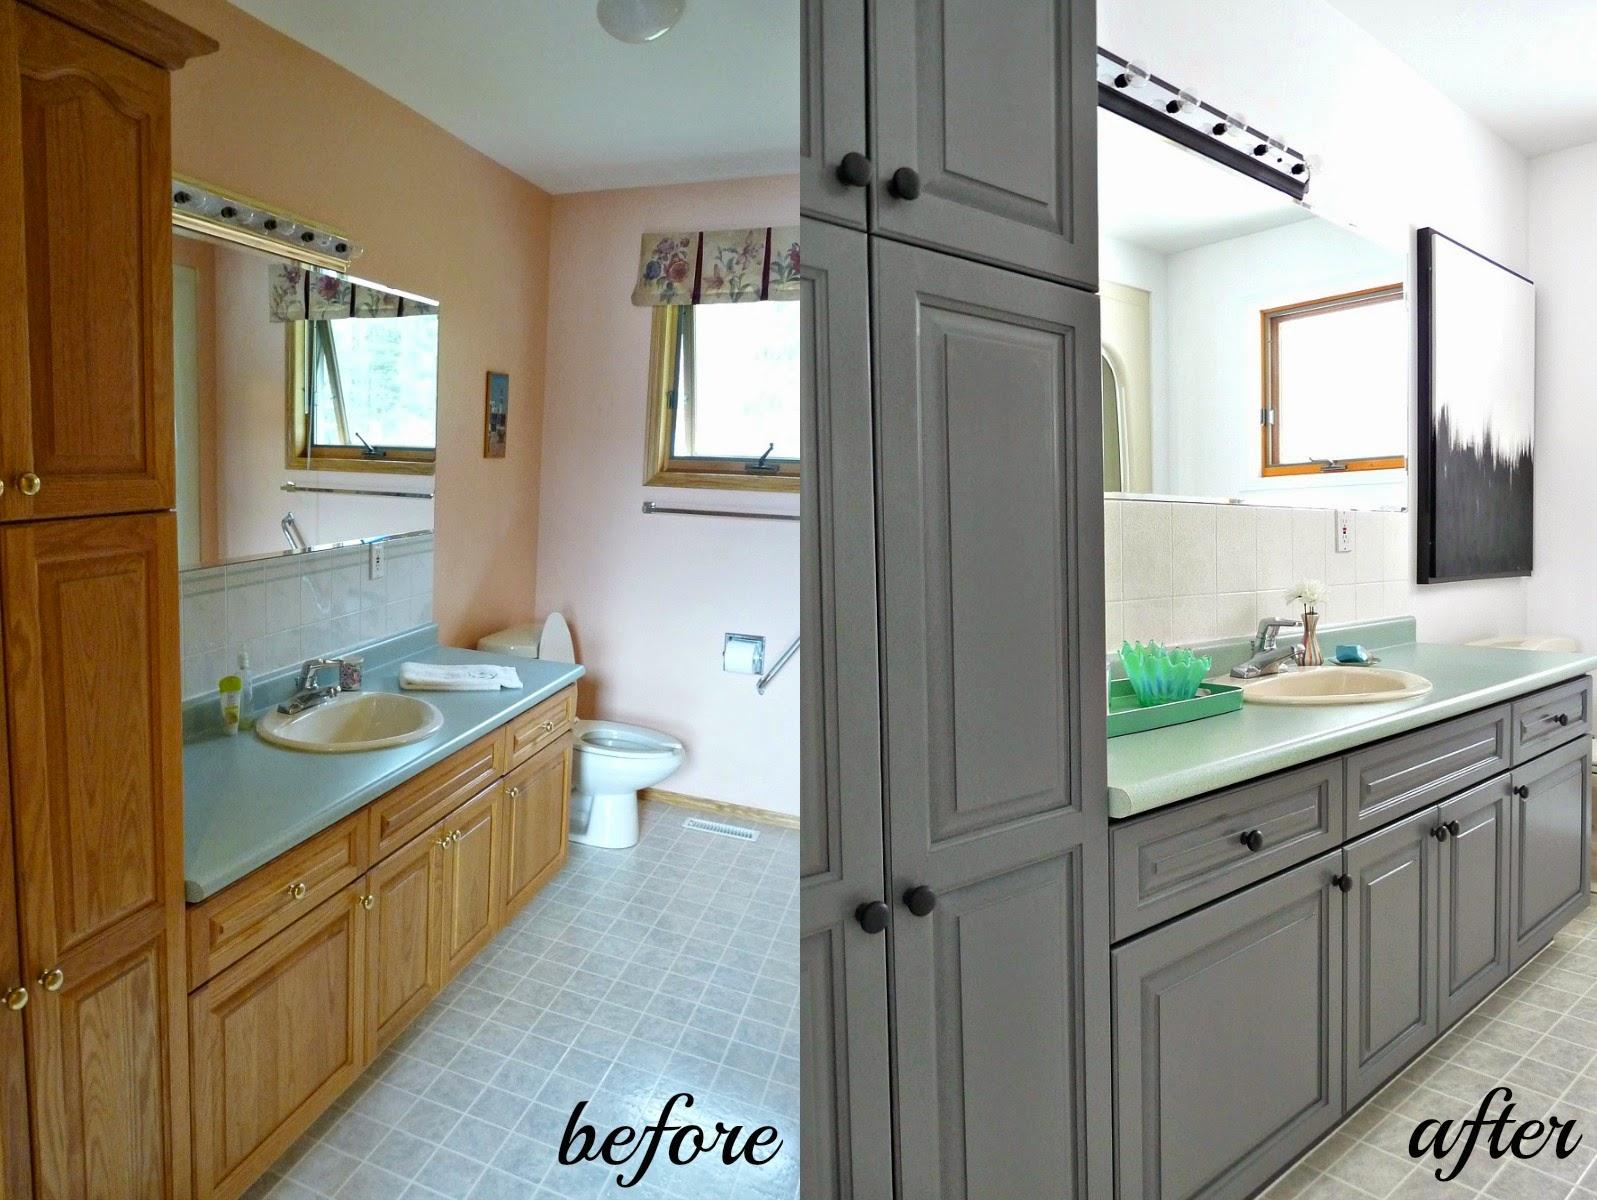 Cabinet Refinishing 101: Latex Paint vs. Stain vs. Rust ...